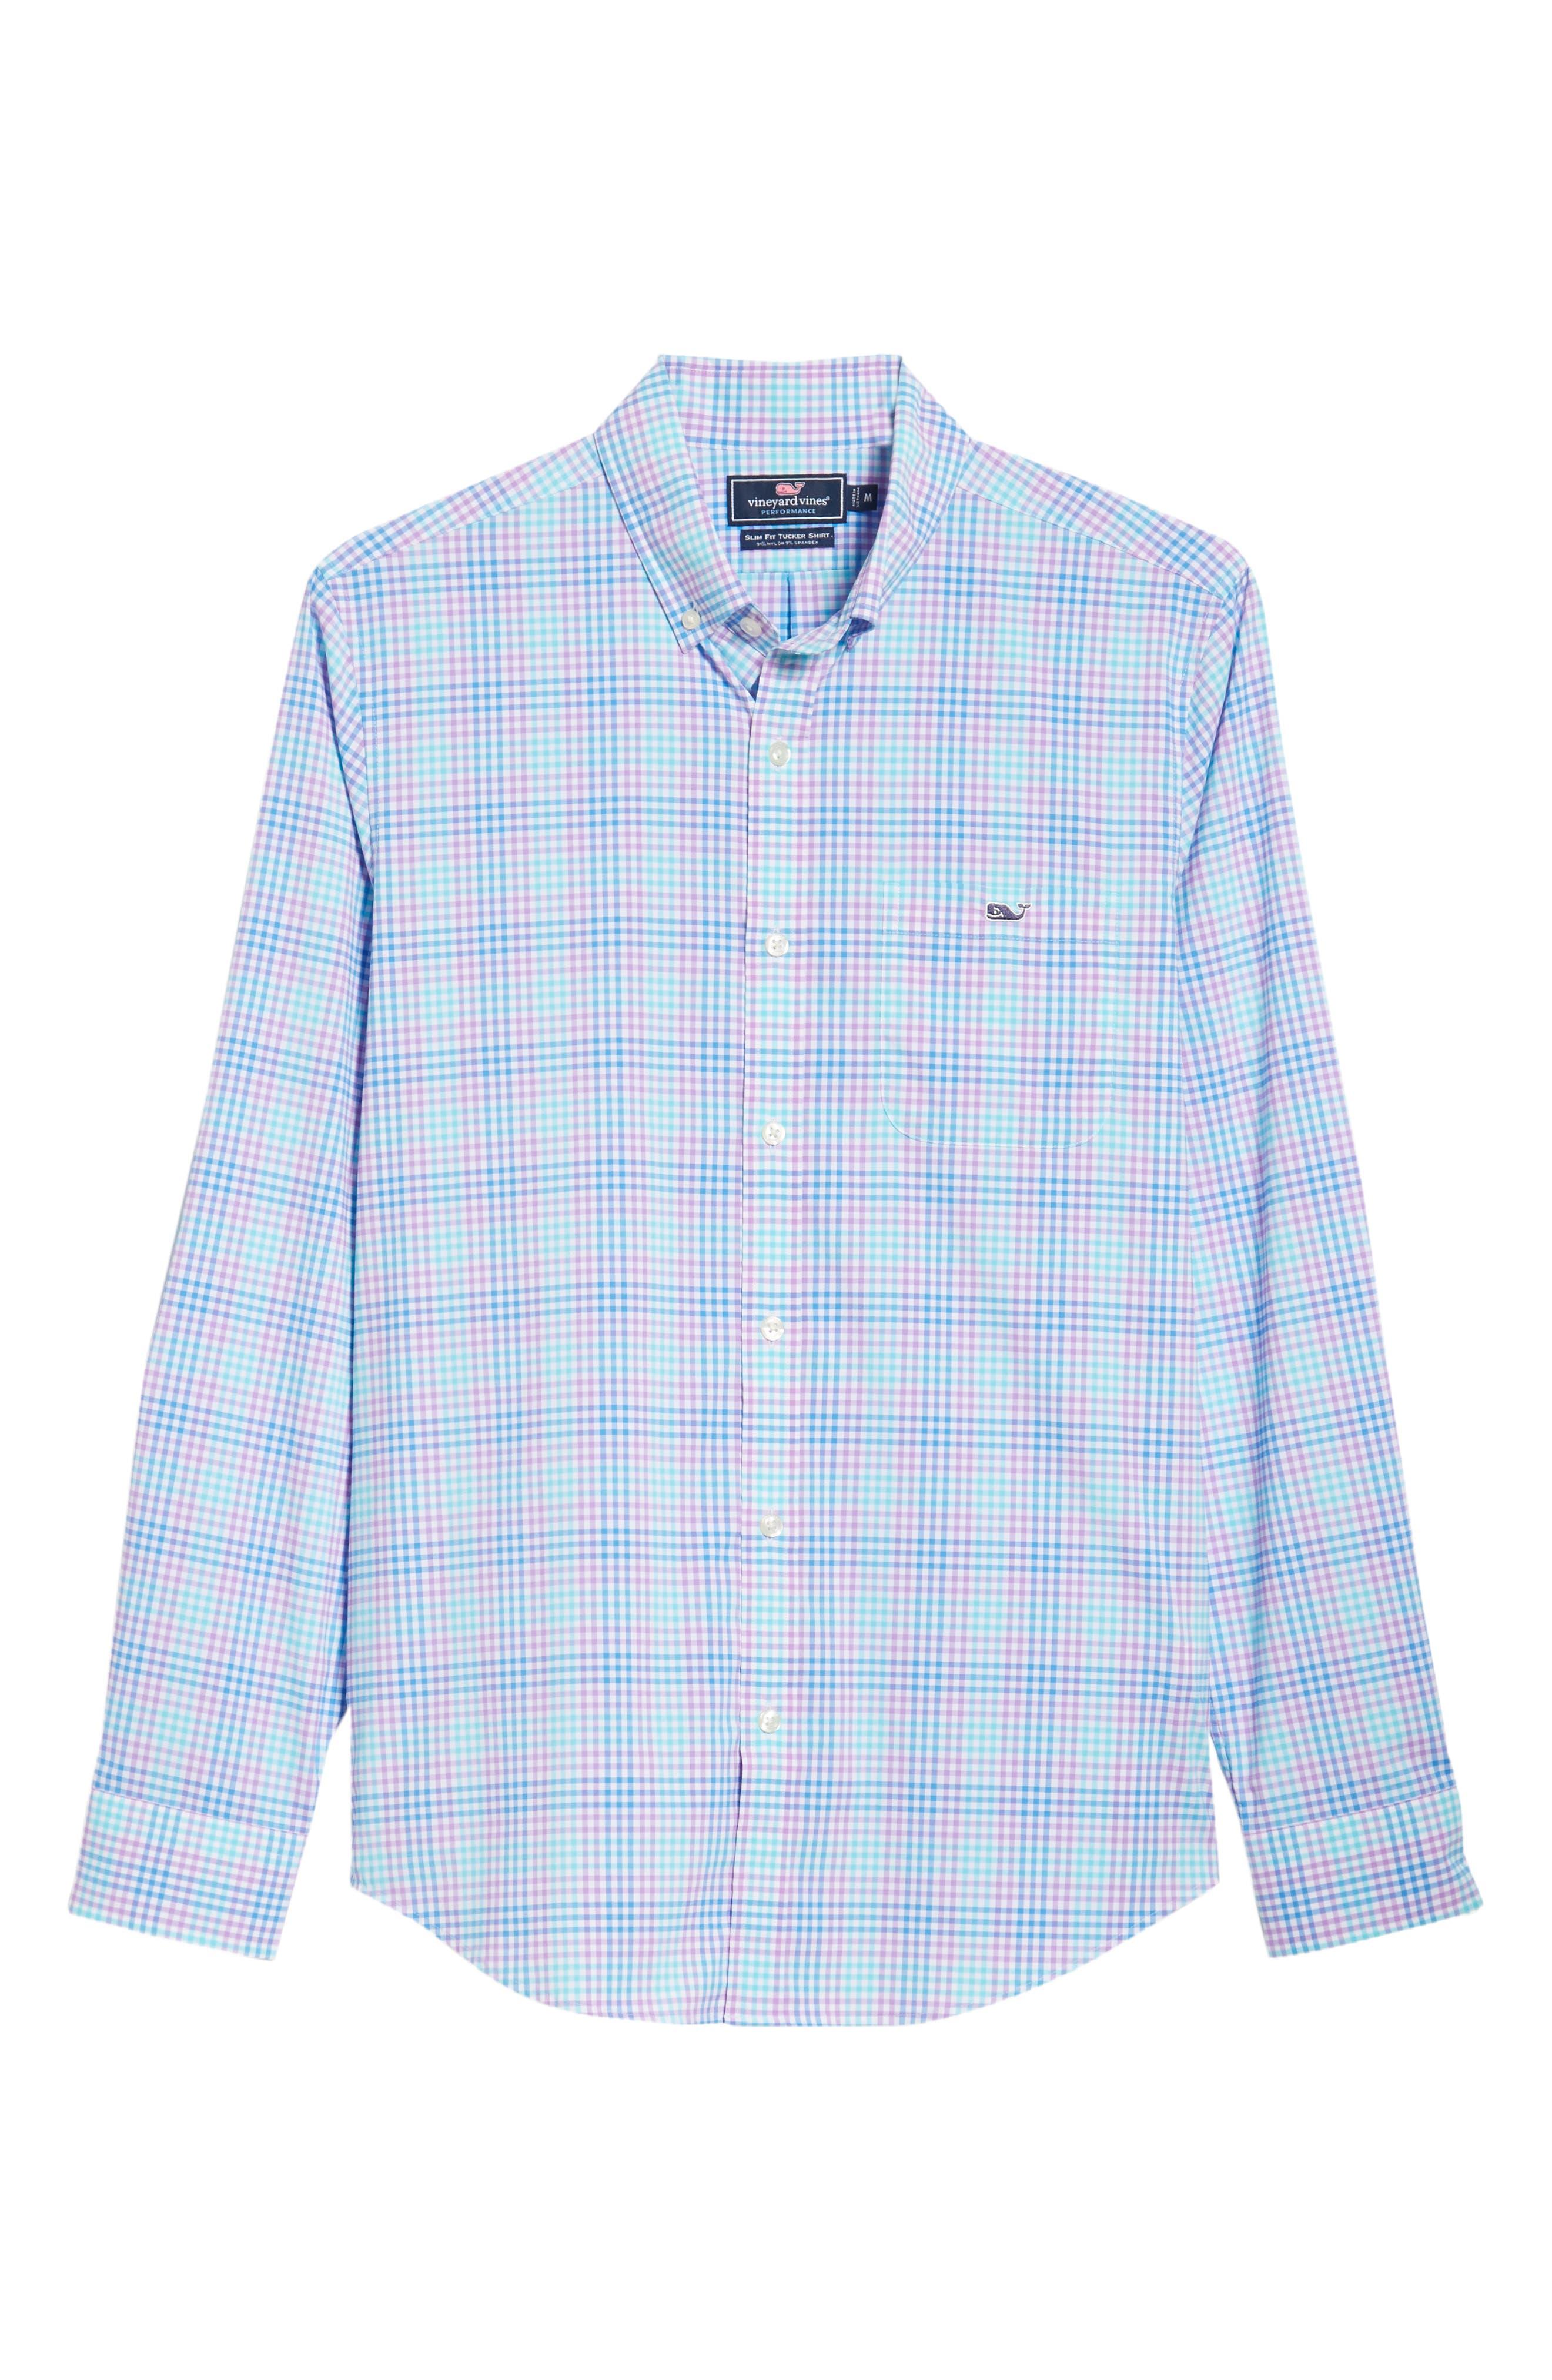 Ridge Hill Slim Fit Check Performance Sport Shirt,                             Alternate thumbnail 6, color,                             Turquoise